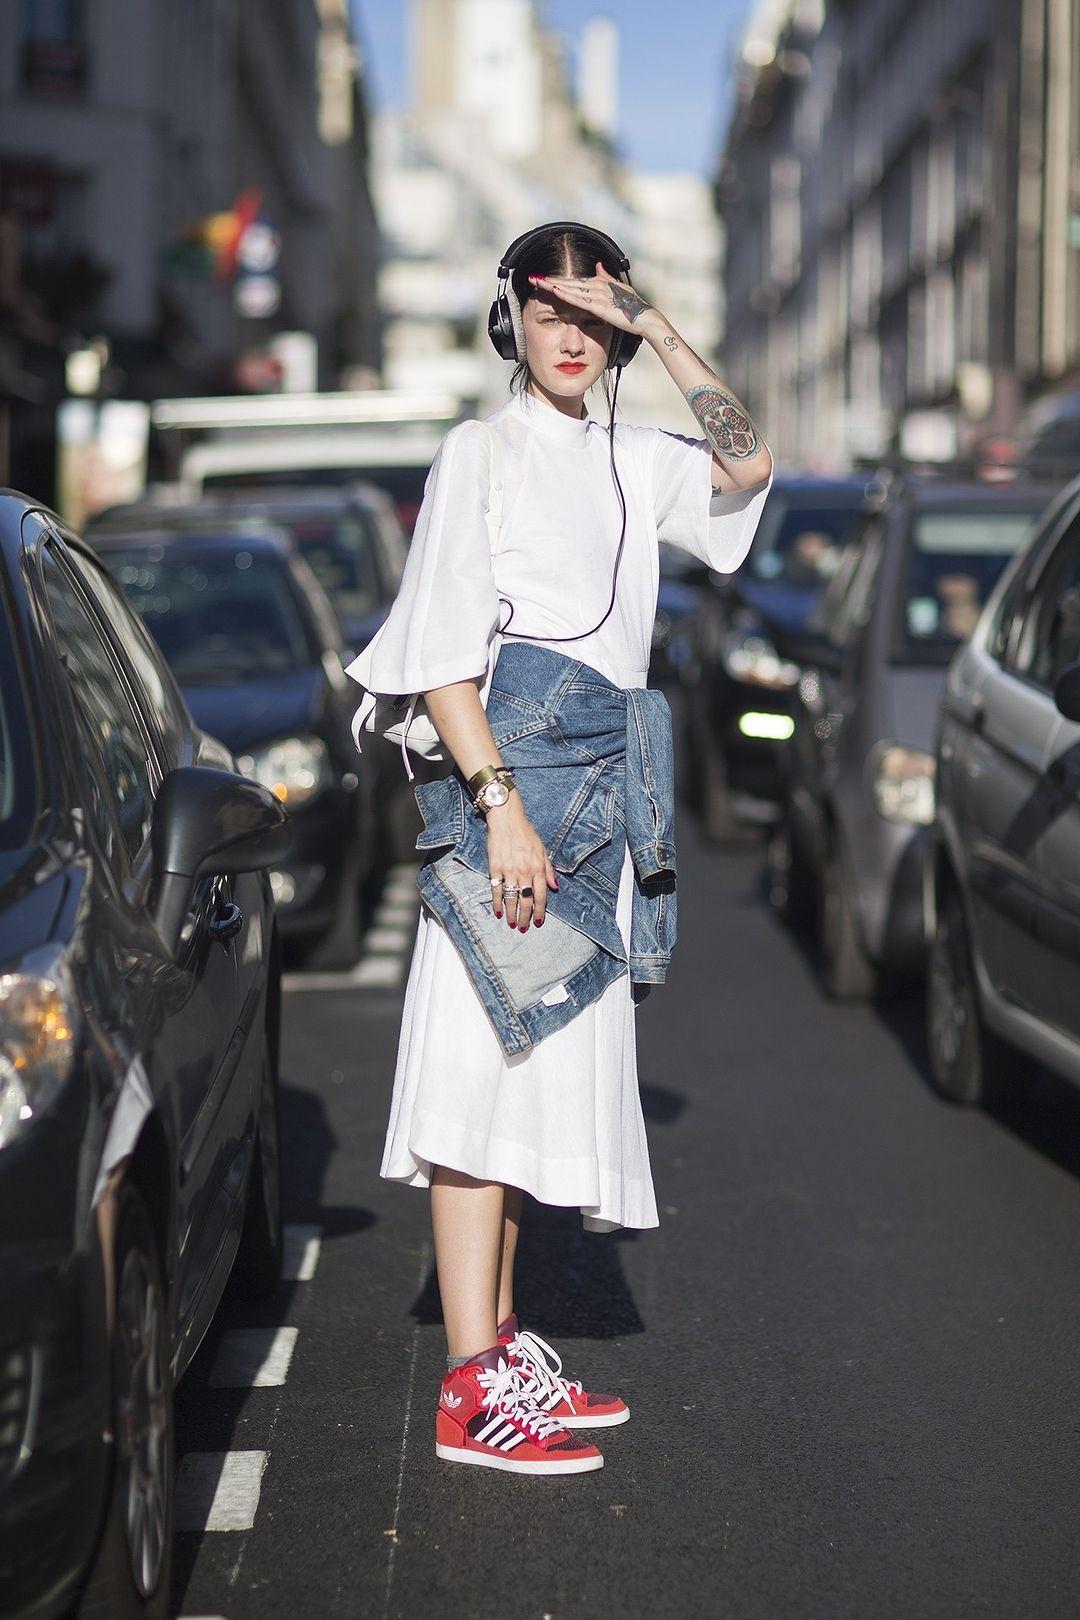 Marianna Theodorsen - More streetstyle pictures from Paris Fashion Week 2014 - Streetstyle - Elsie Fashion Forum